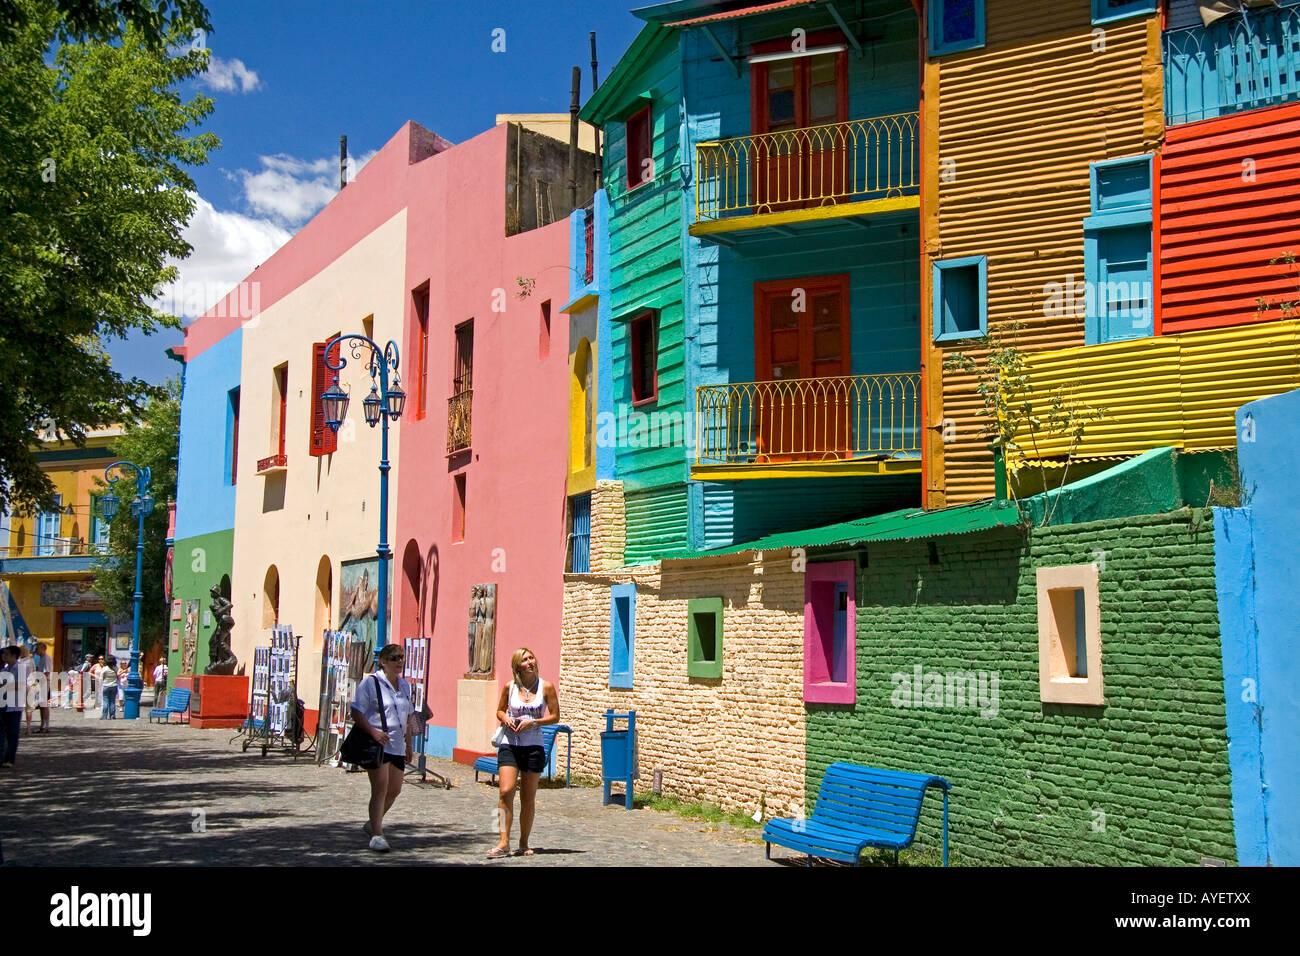 Colorful Buildings In The La Boca Barrio Of Buenos Aires Argentina